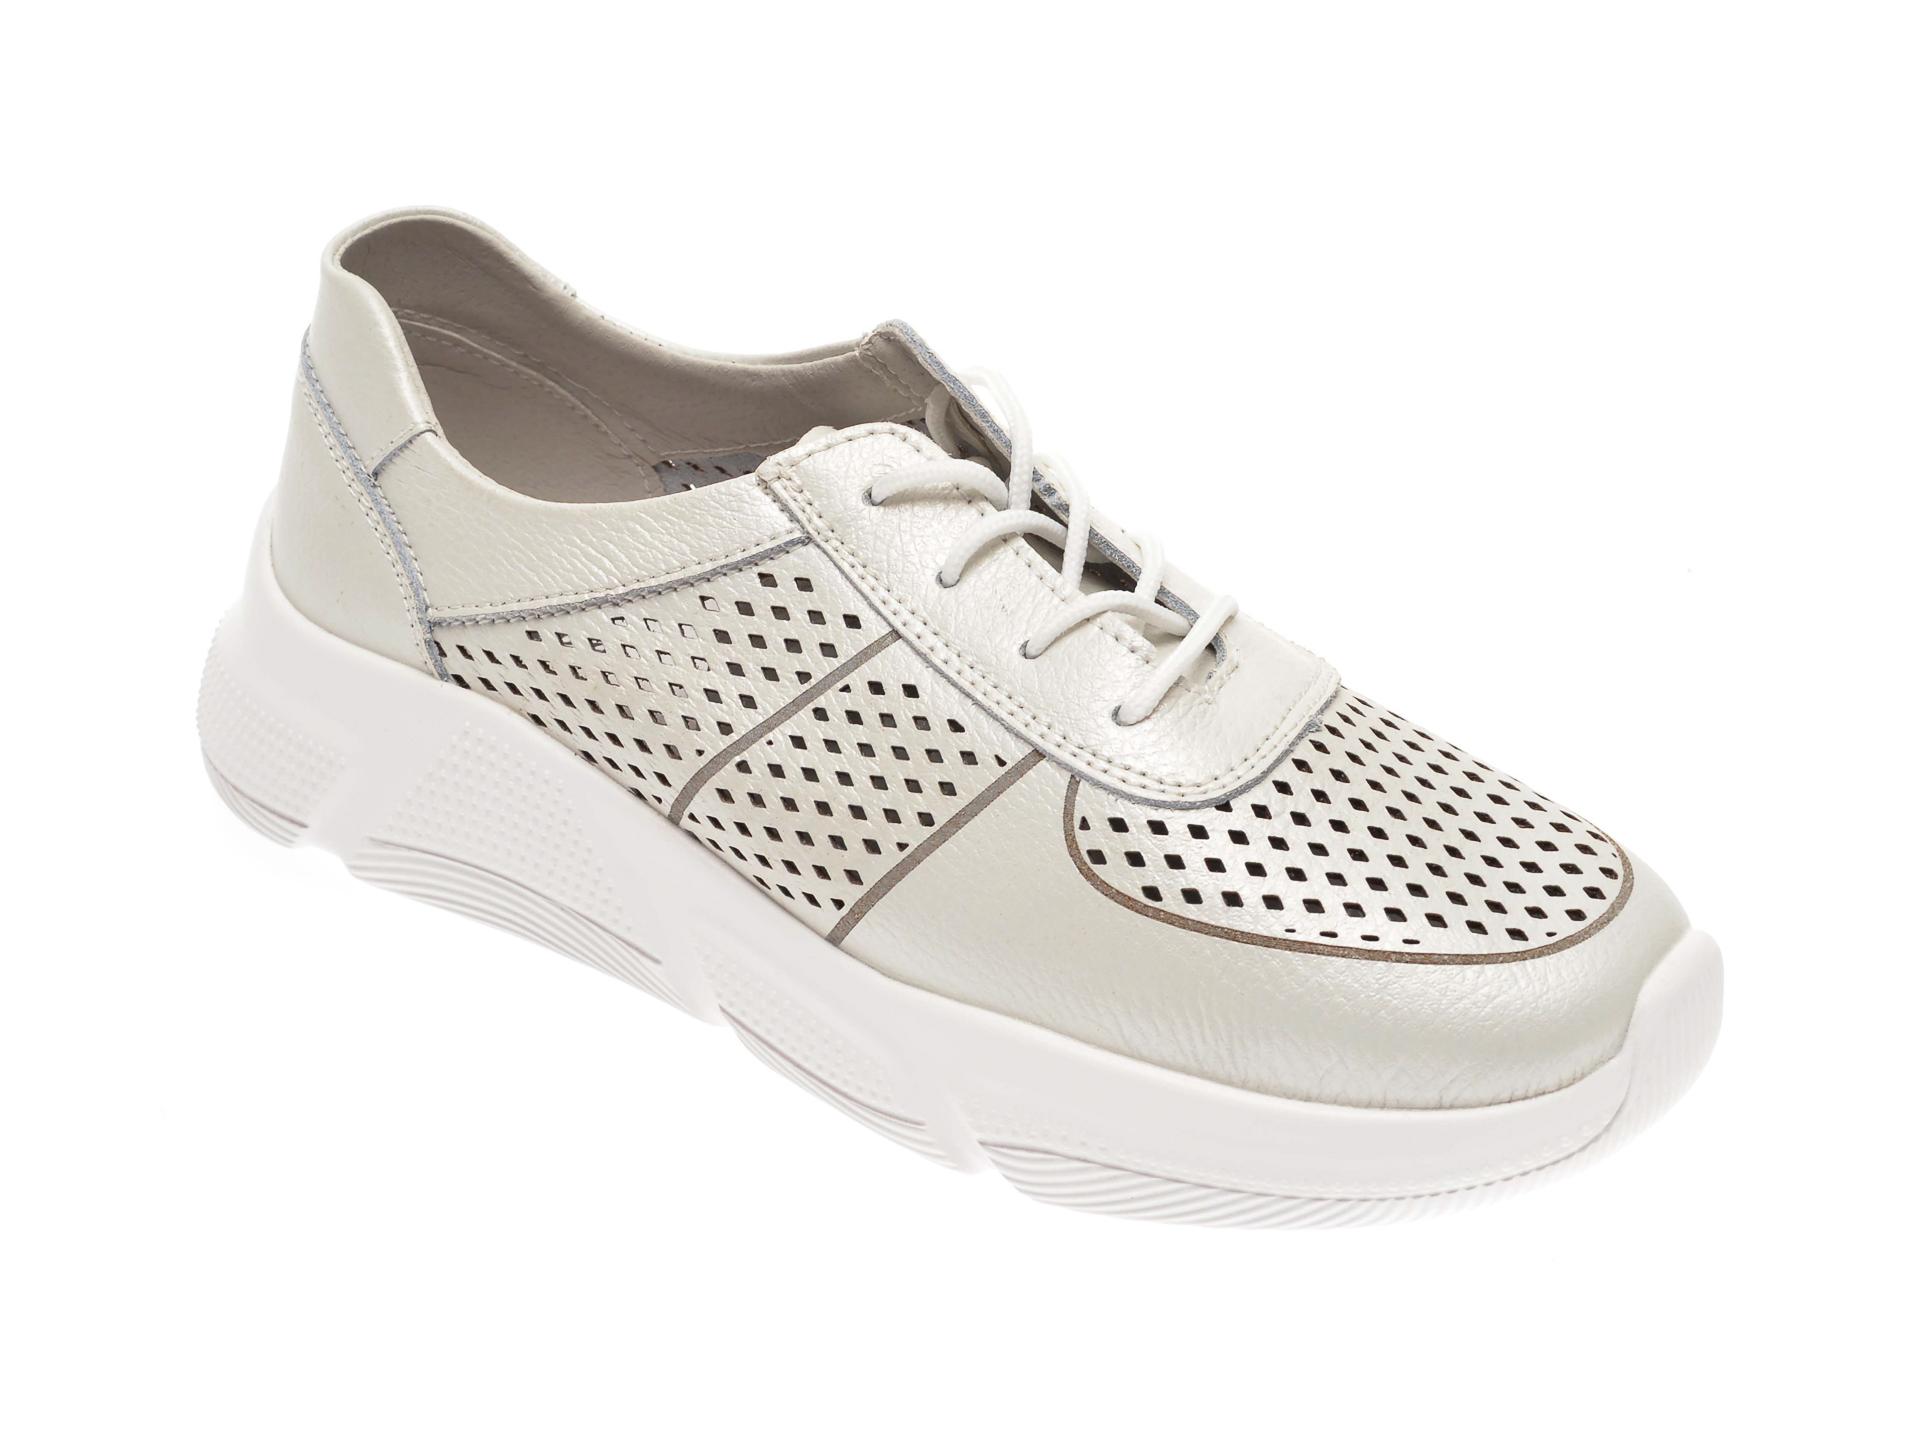 Pantofi IMAGE albi, 806, din piele naturala imagine